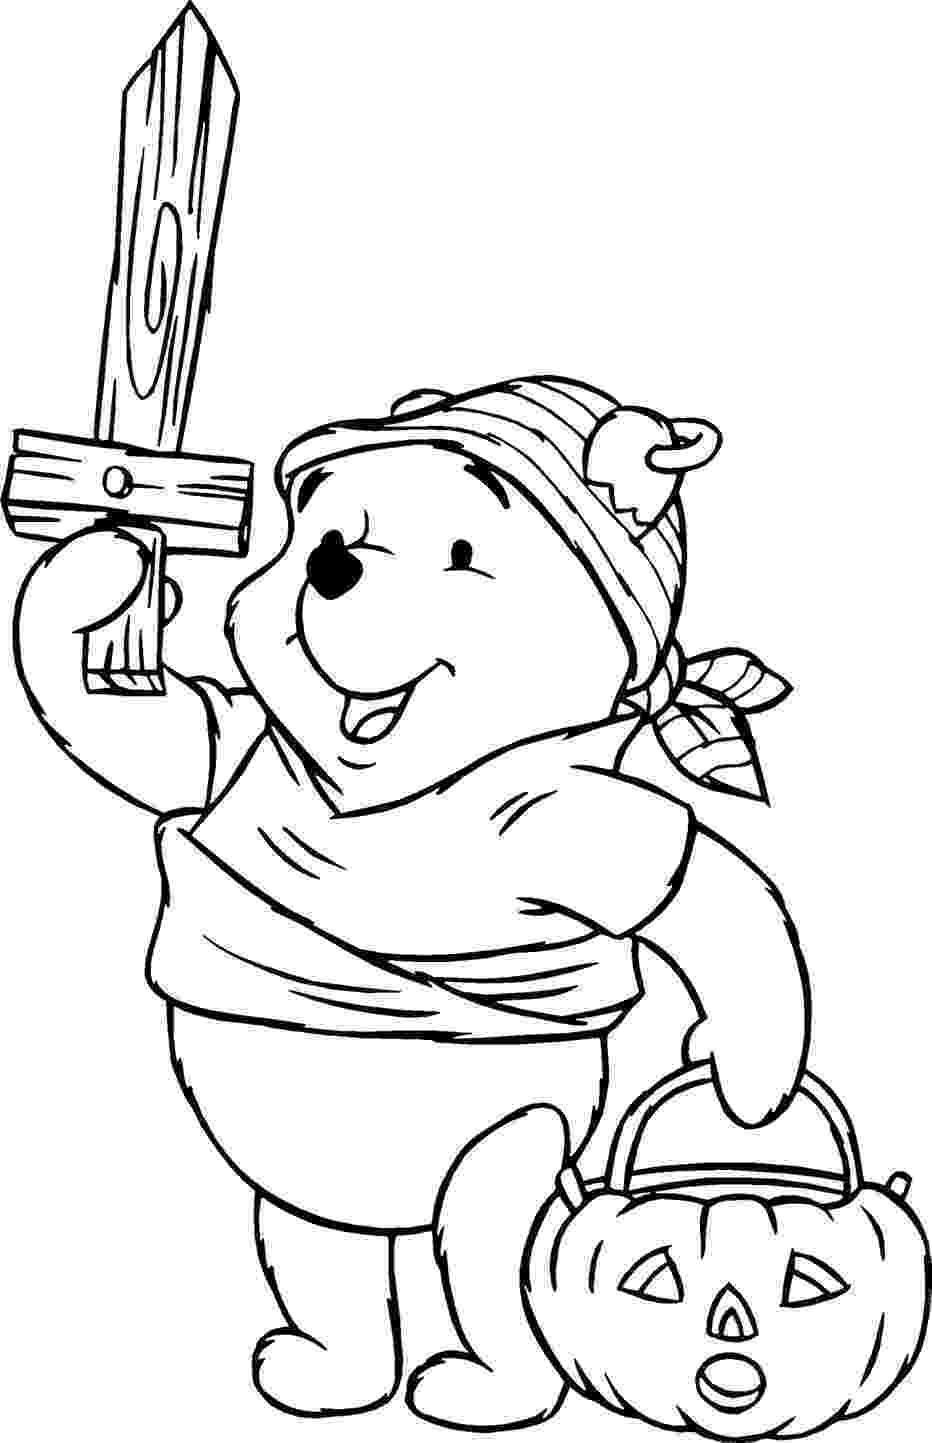 winnie pooh colouring pages winnie the pooh coloring pages learn to coloring colouring pages pooh winnie